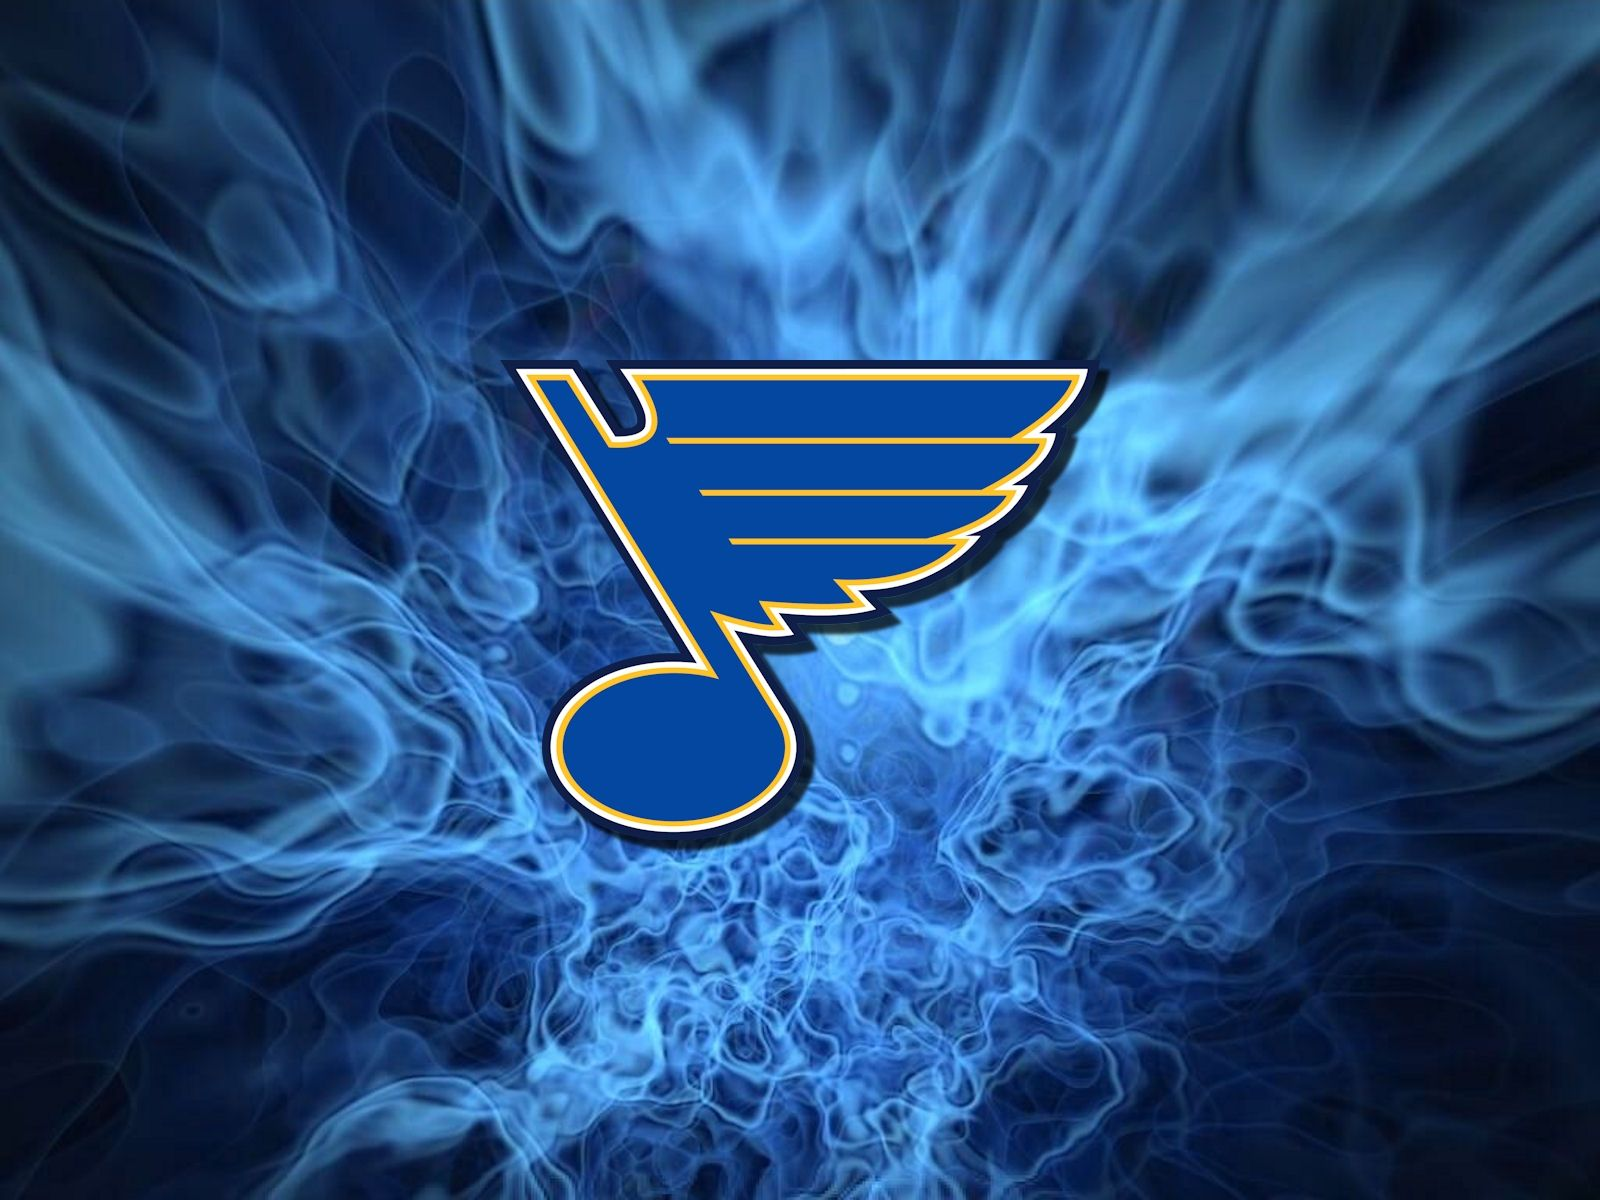 St Louis Blues Wallpaper In 2020 St Louis Blues St Louis Blues